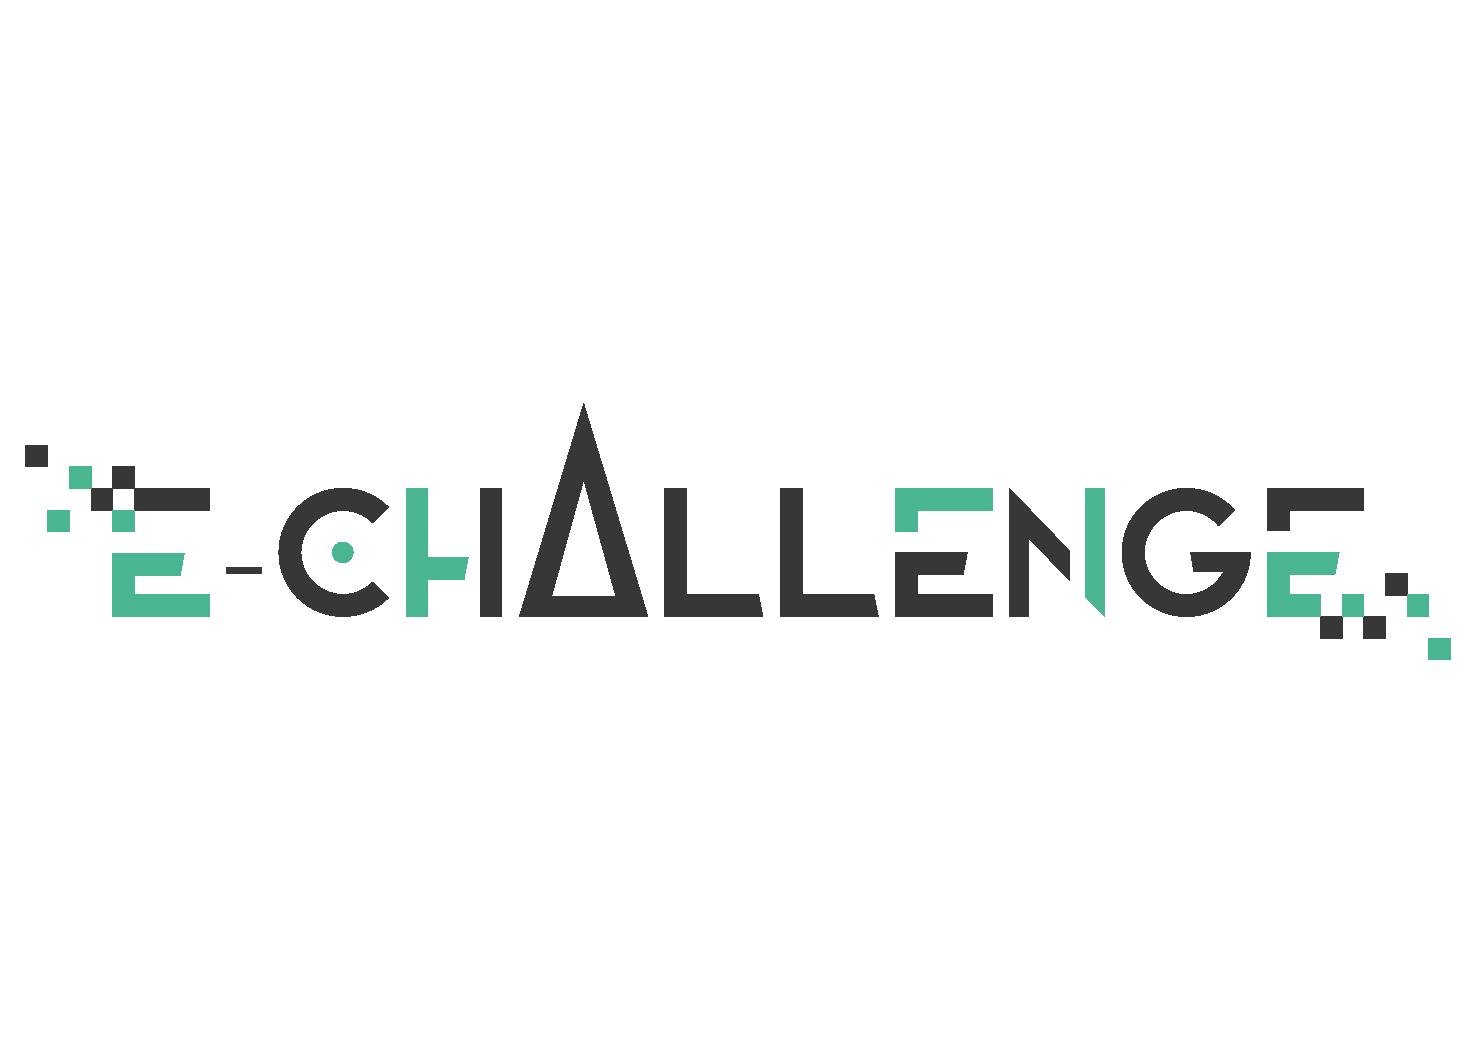 Team Building logo E-Challenge